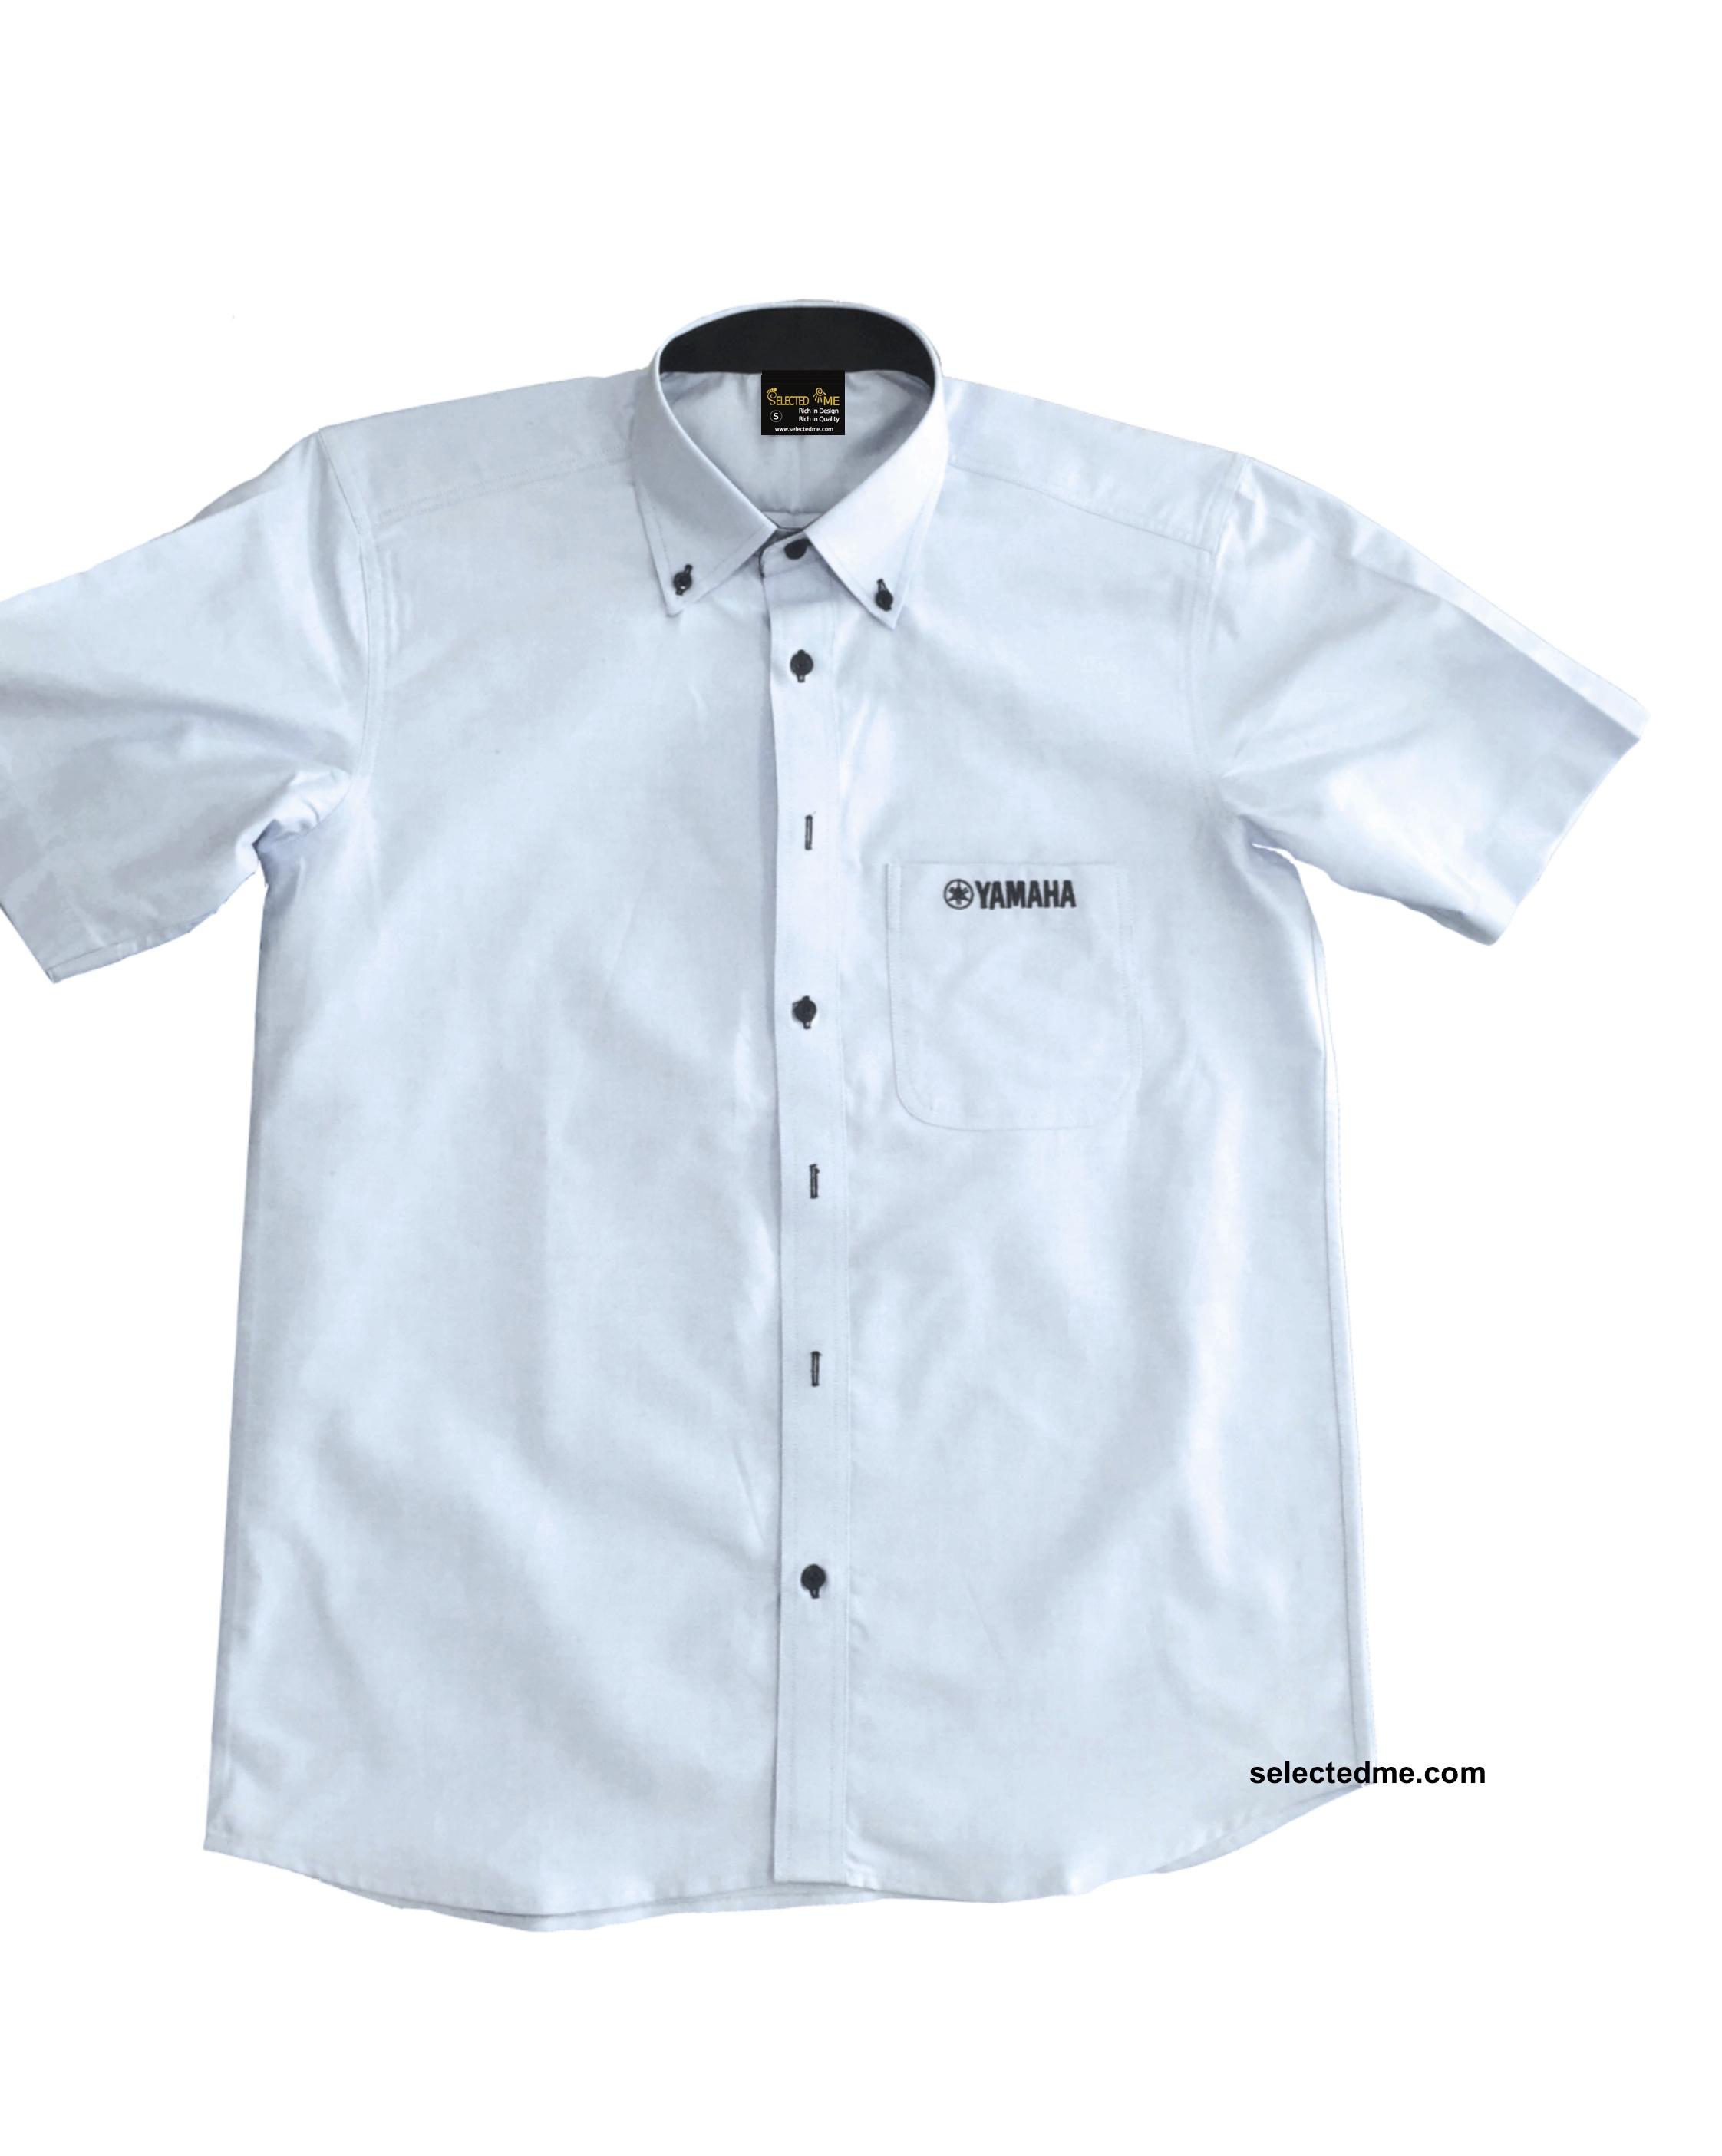 office shirt uniform photo - 1